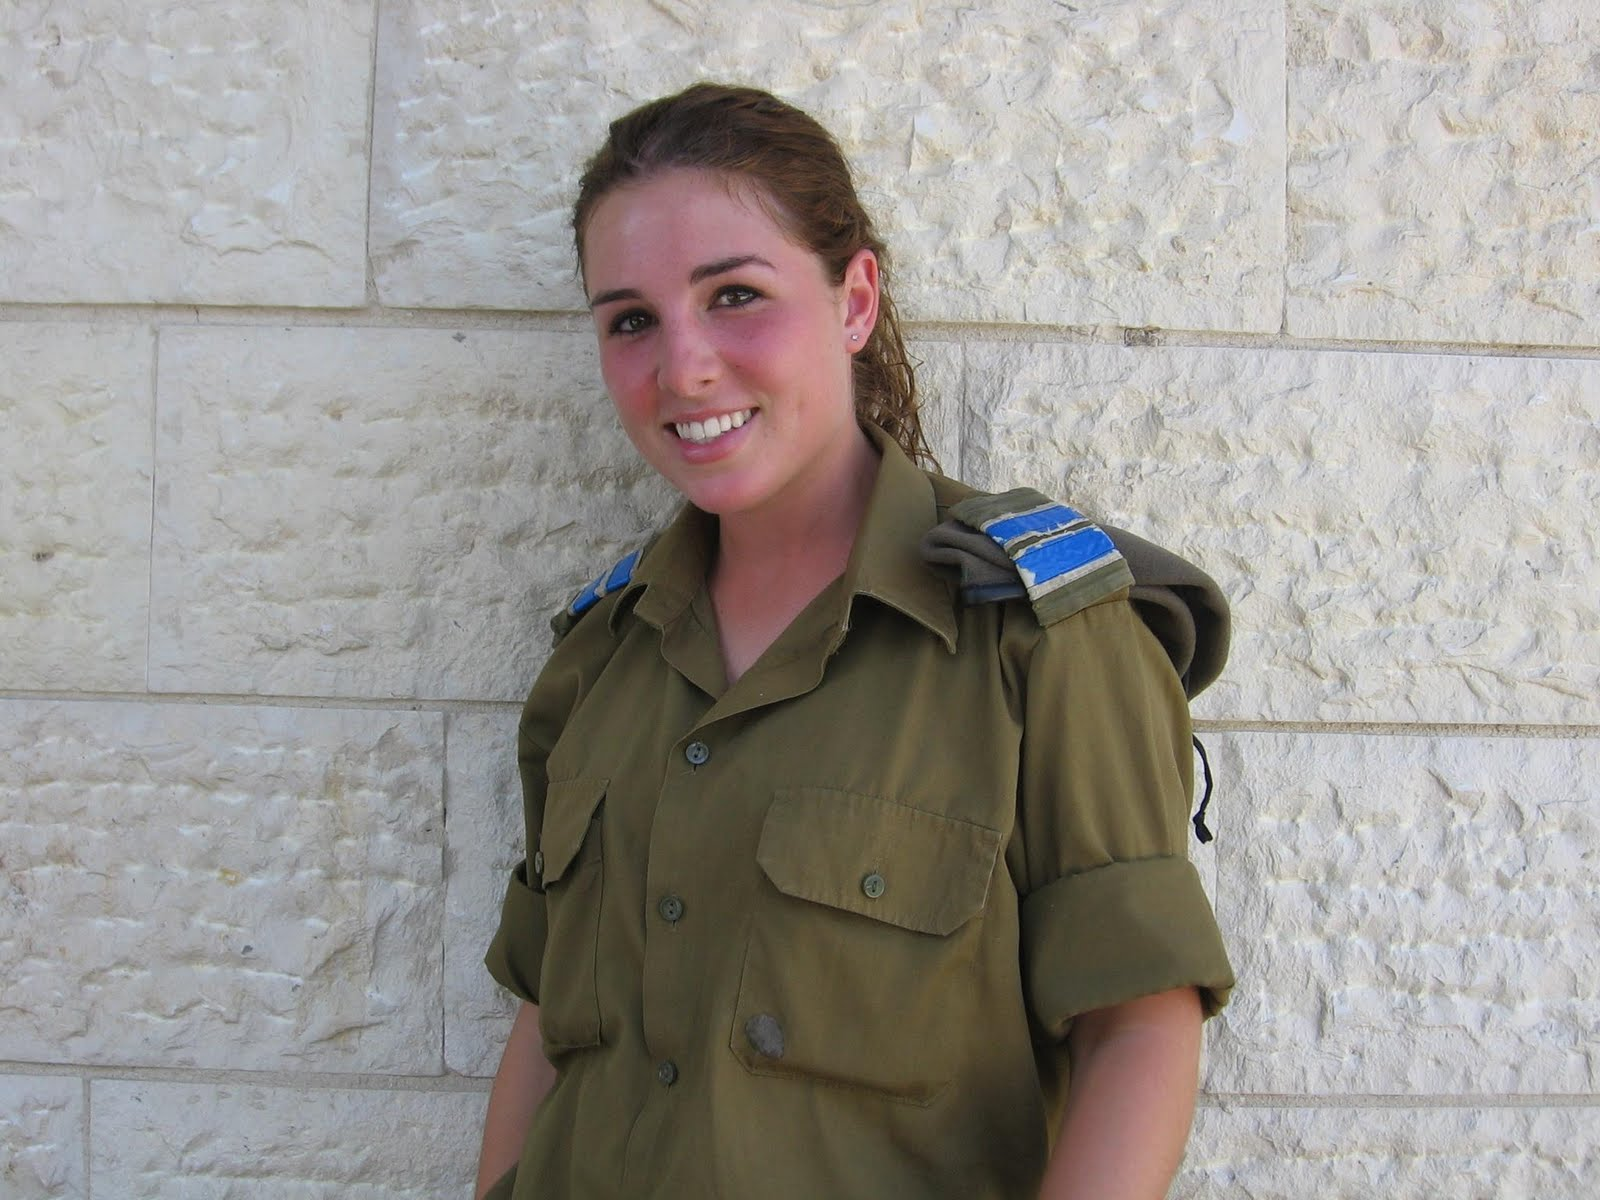 Israeli Women Army Soldiers  Women Army-9825